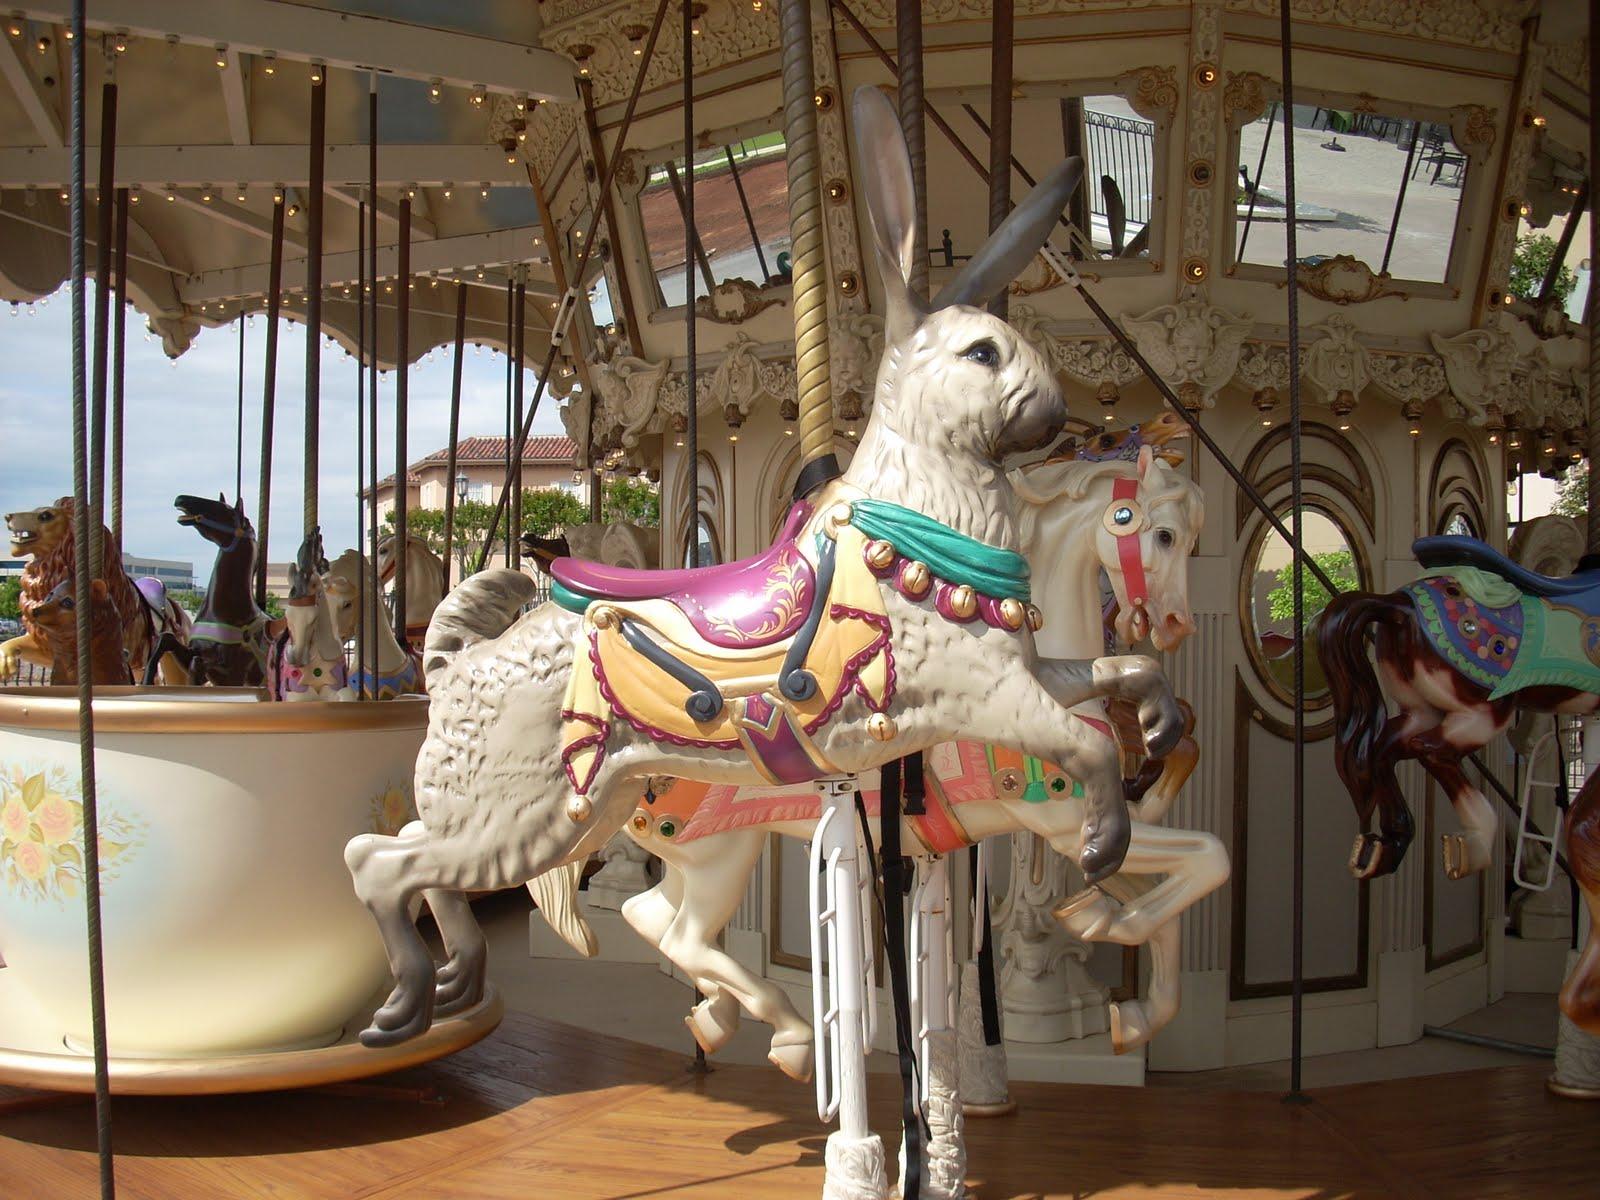 ART In The WIND Carousel Surprise